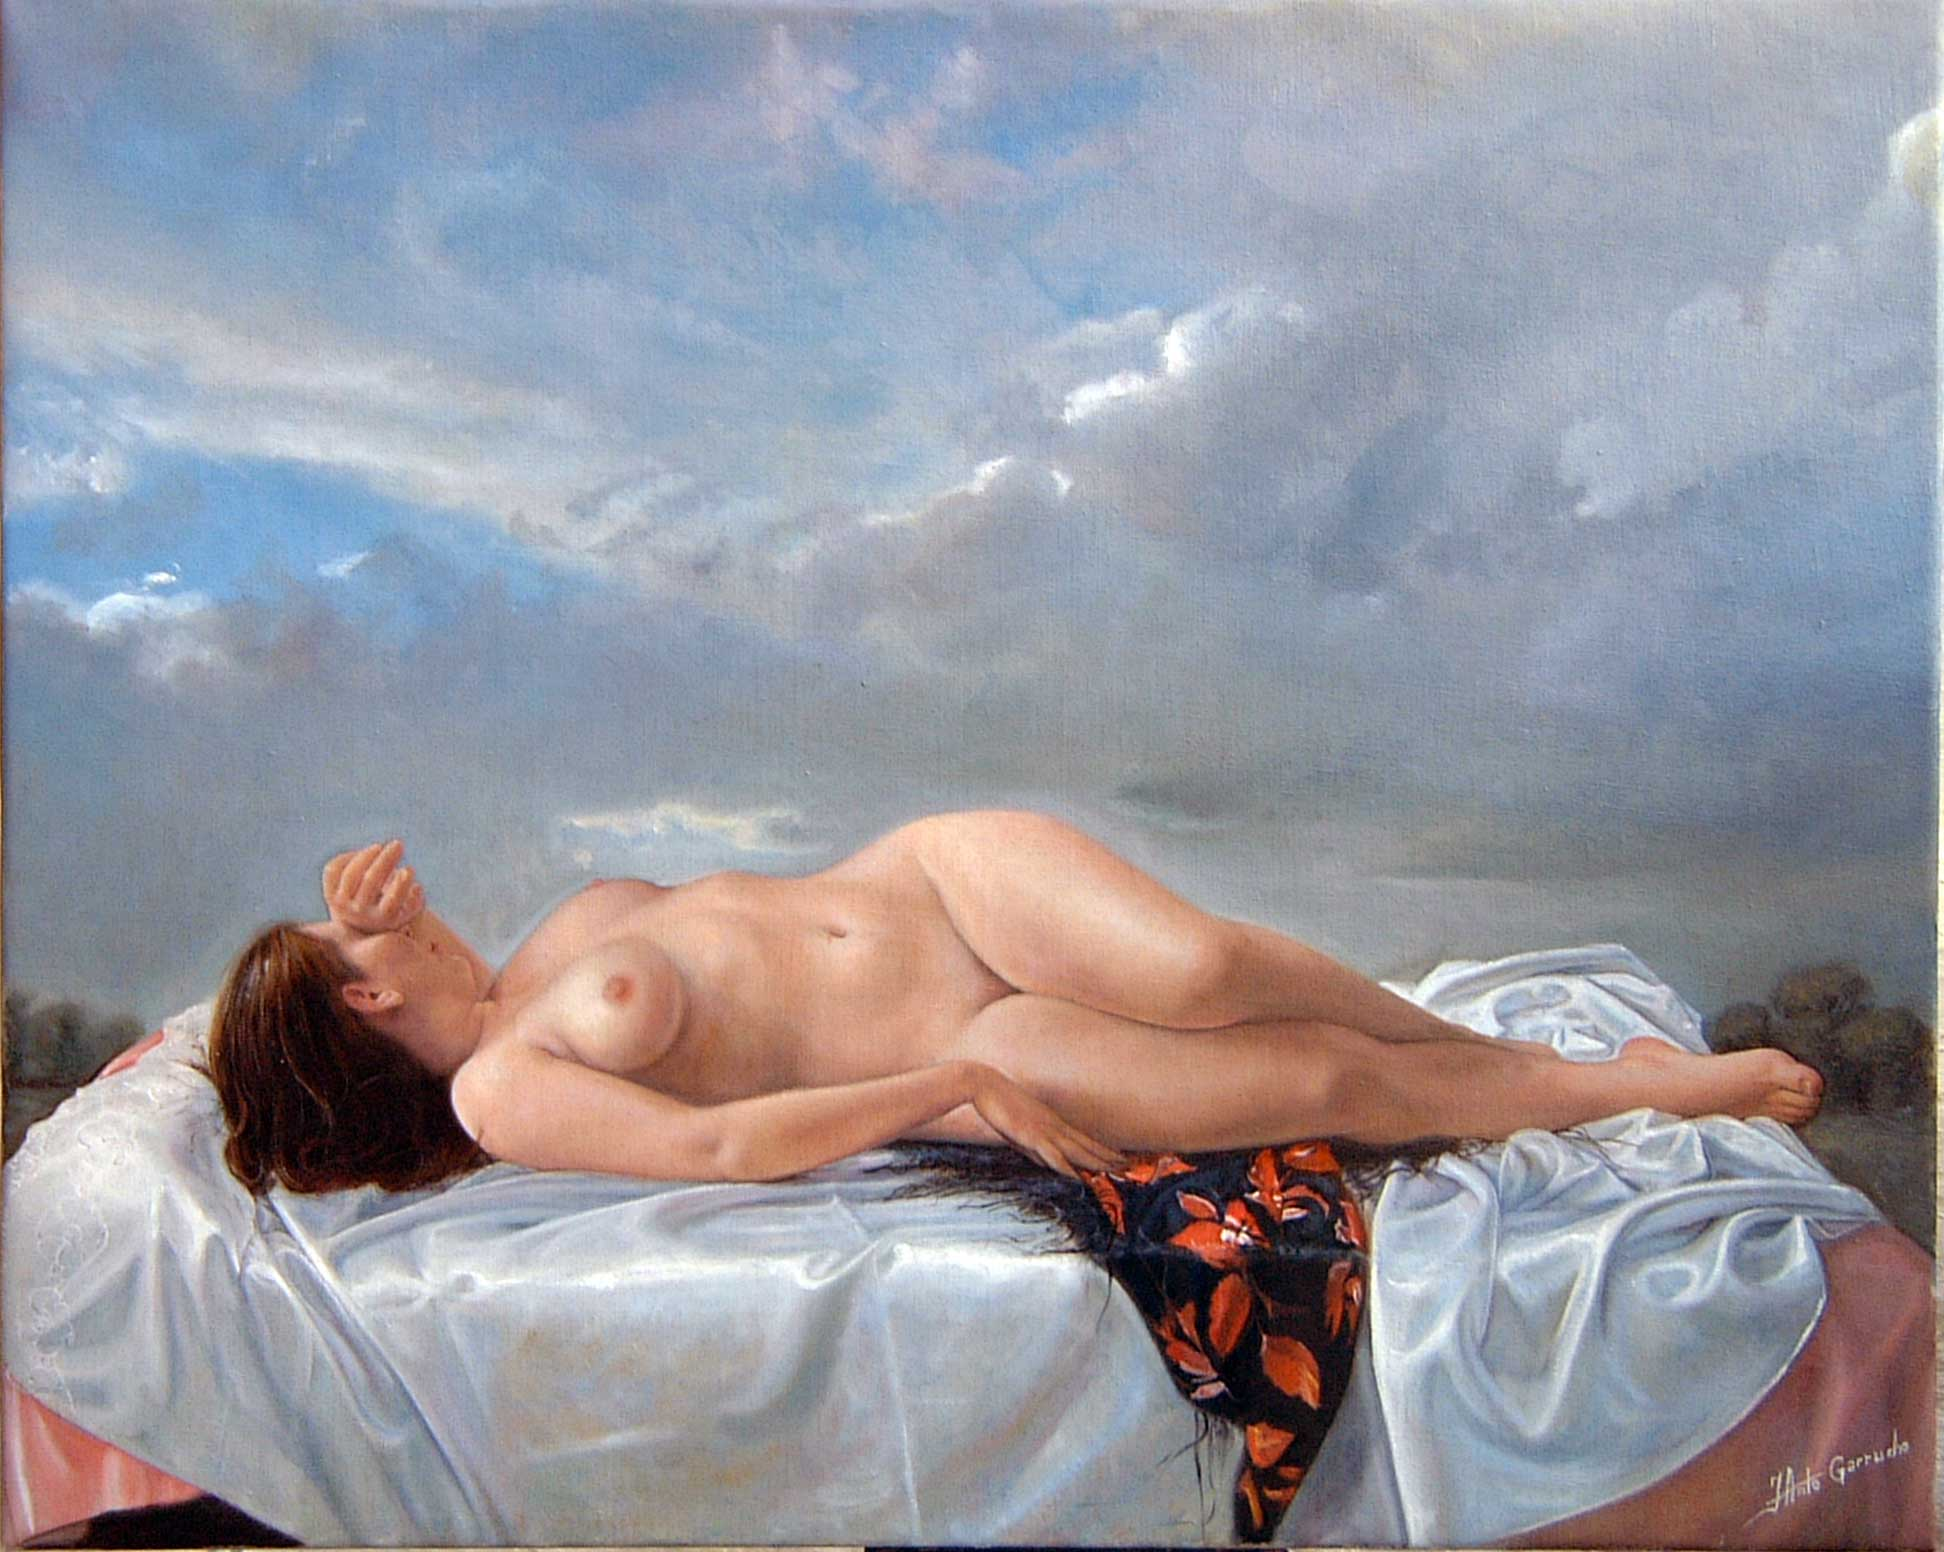 Desnudo sobre sábanas de raso